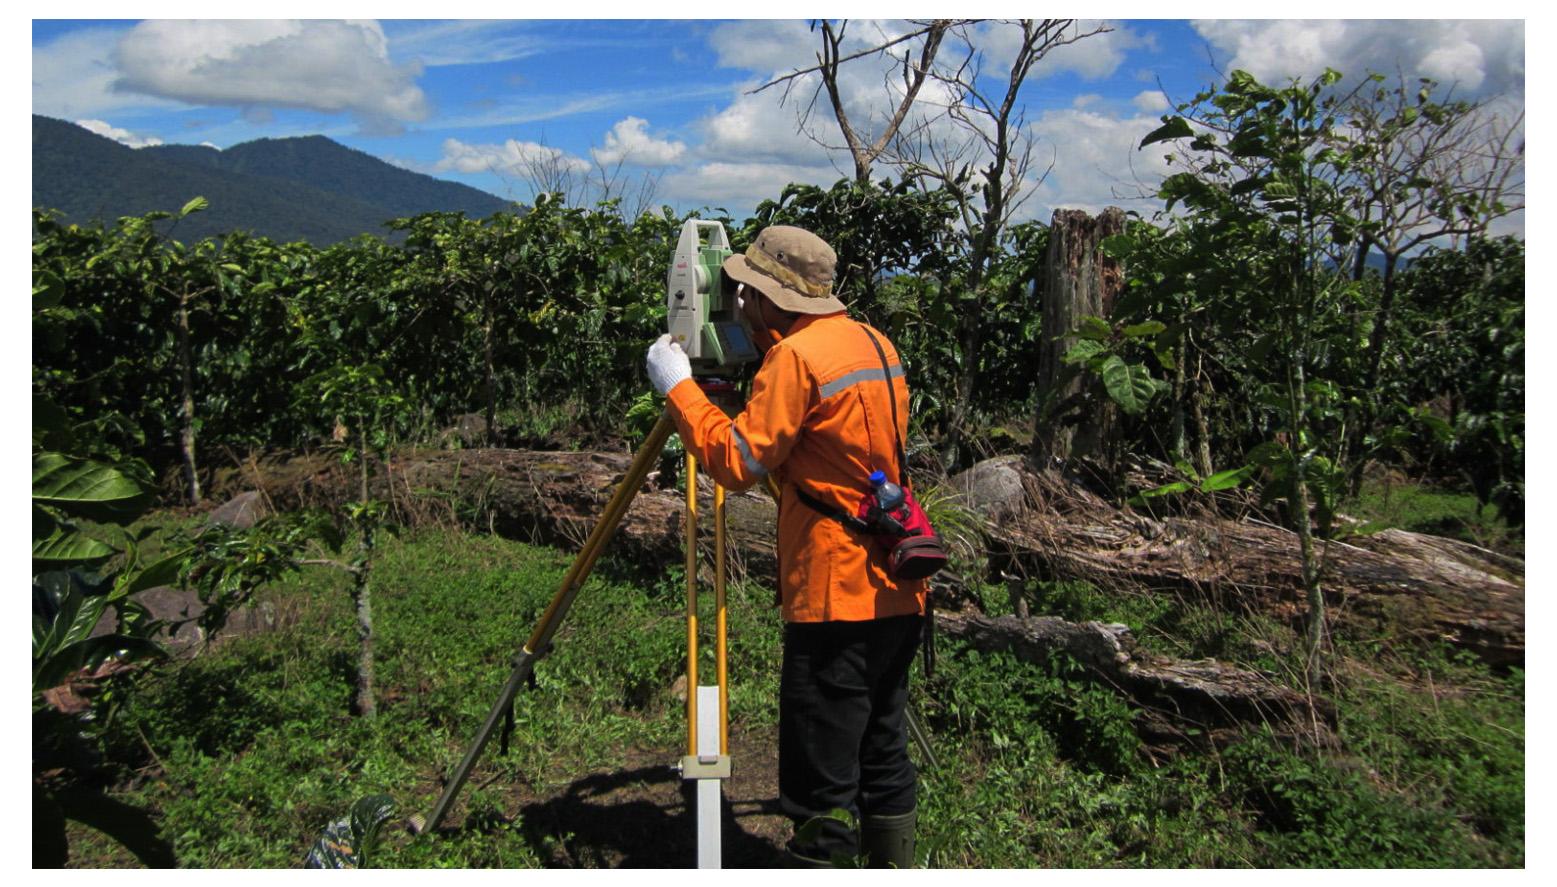 Memilih Jasa Pemetaan / Pengukuran Tanah & Topografi pada Pekanbaru Terpercaya